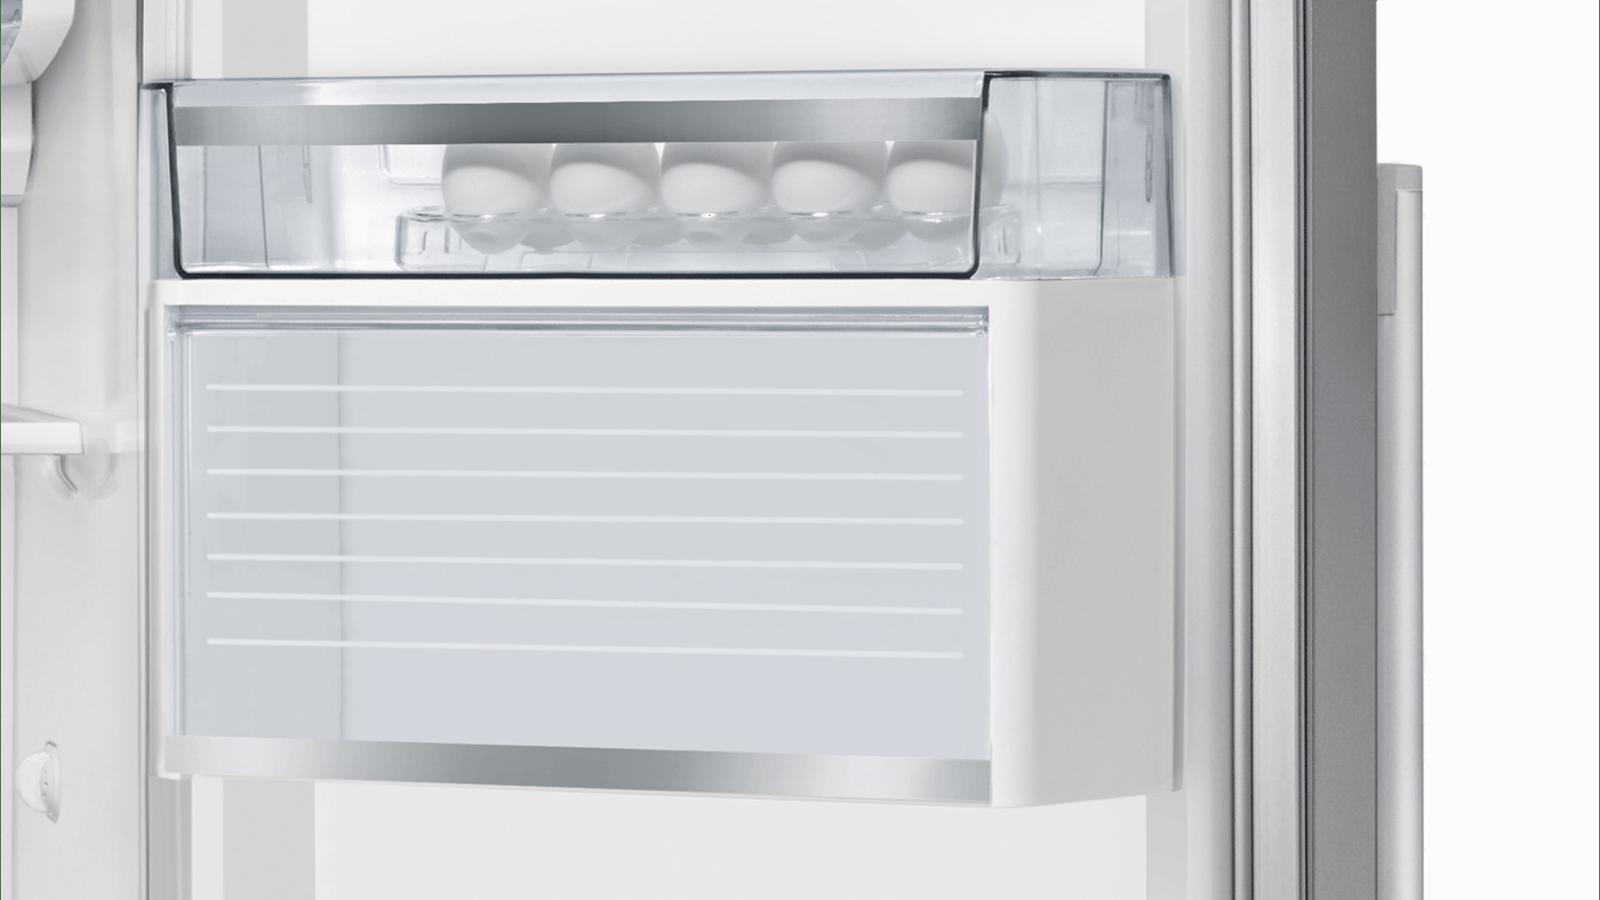 Refrigerateur Americain Faible Largeur iq500 sideside américain 177 x 91 cm inox-easyclean ka90dvi20